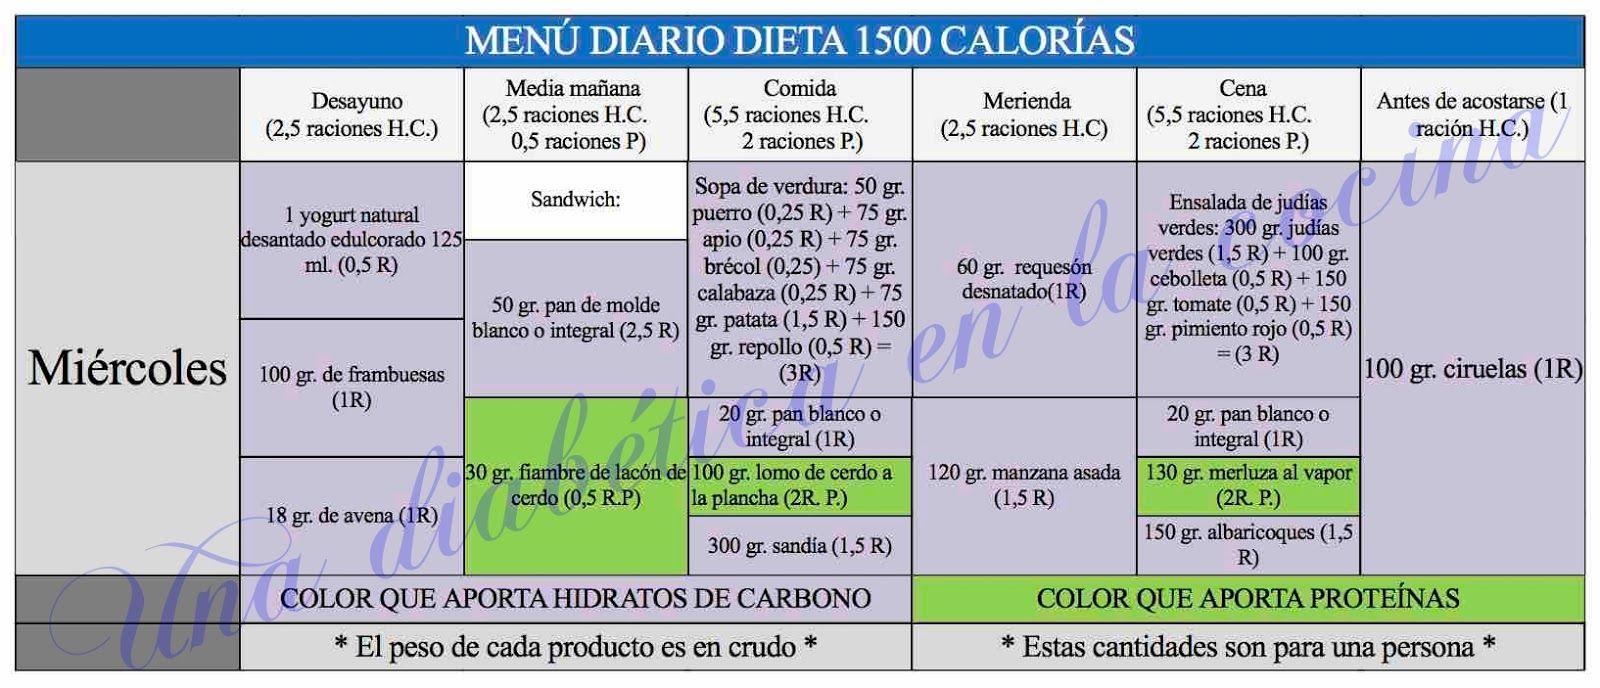 Dieta diaria de 1500 calorias